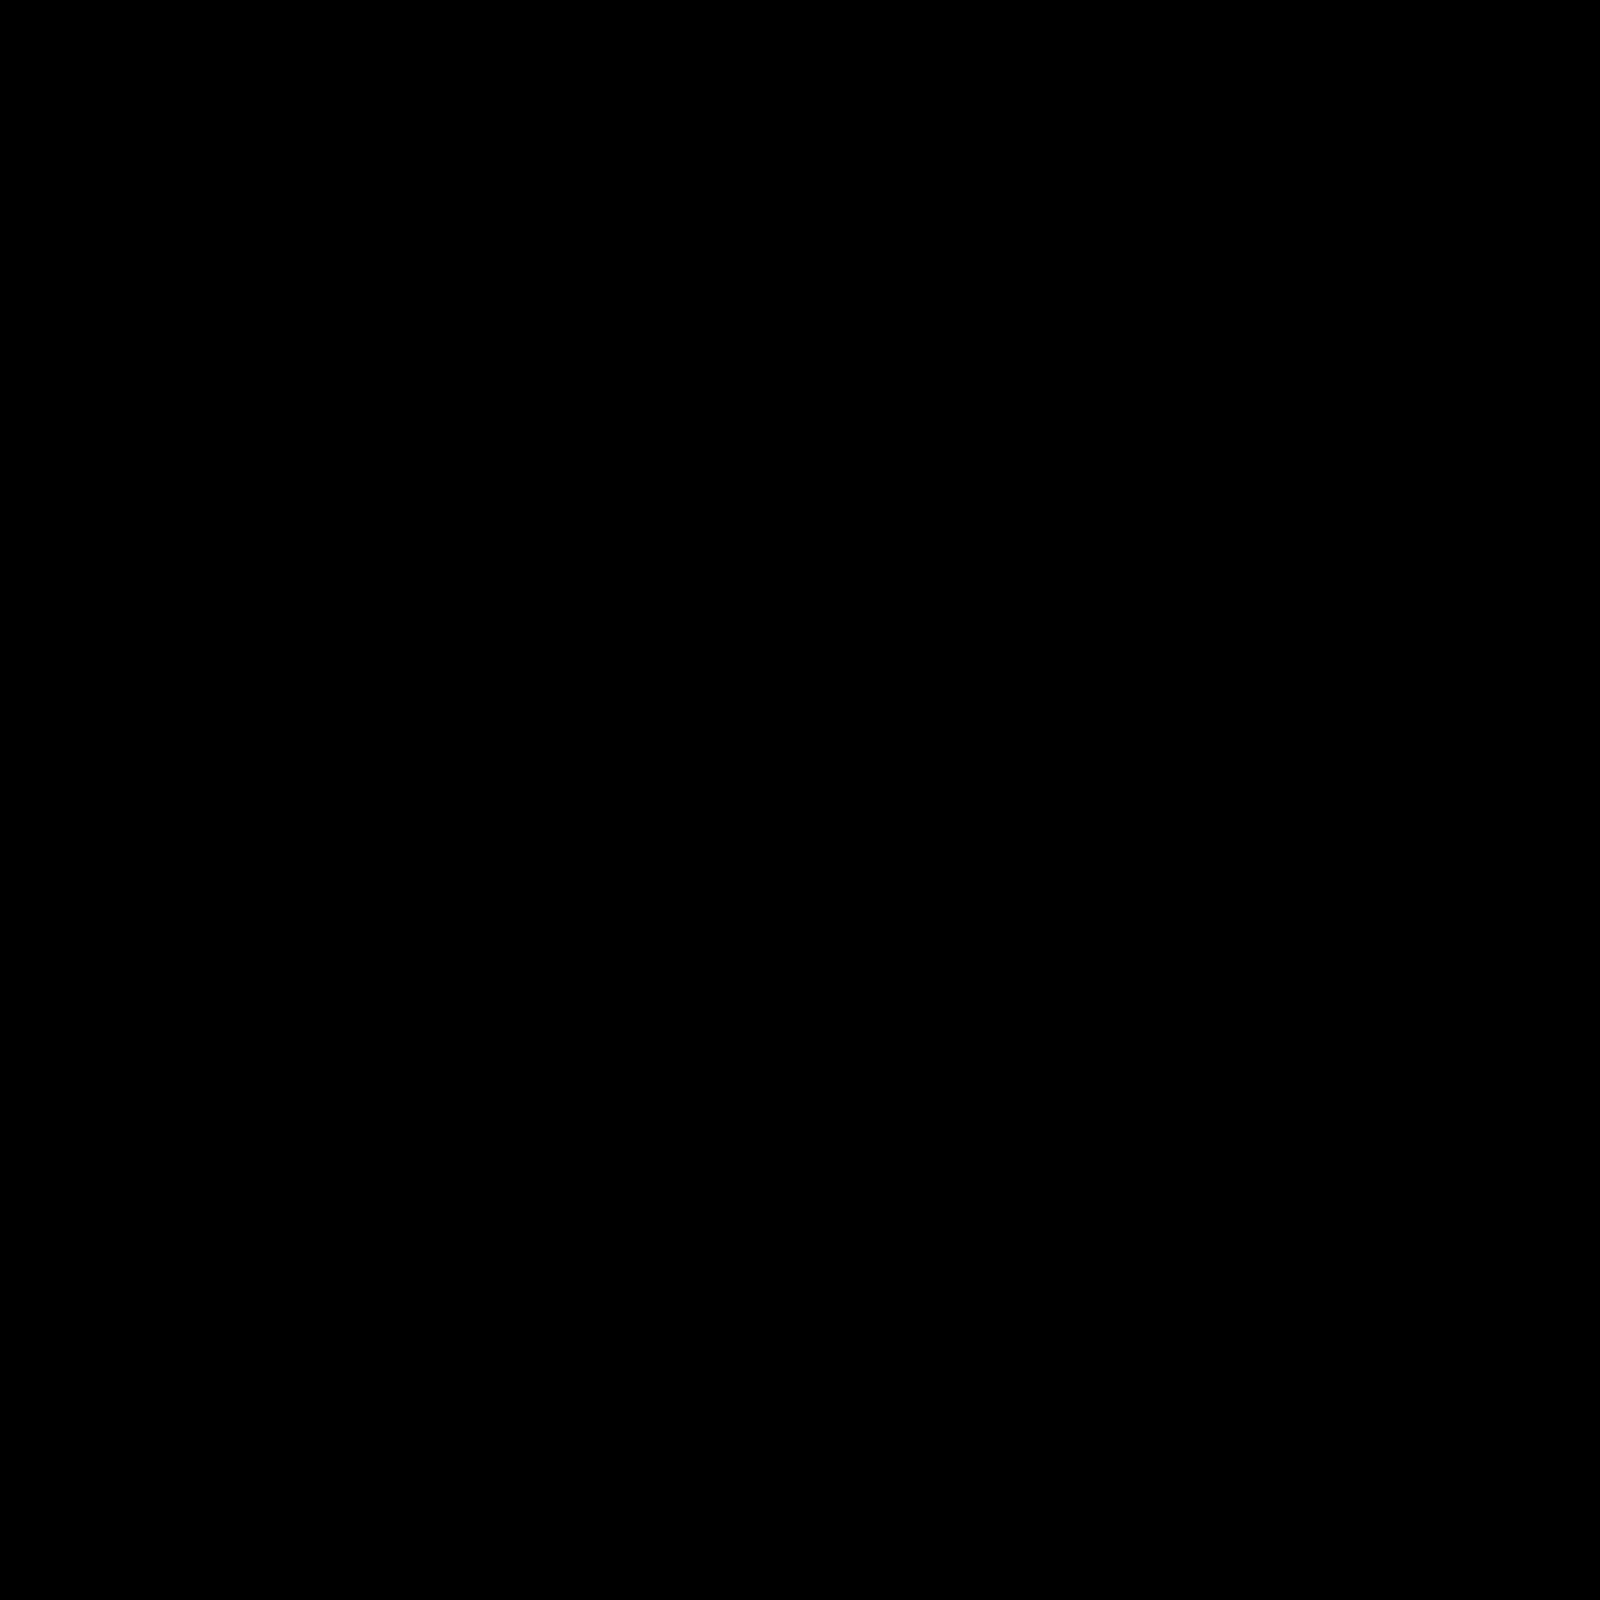 Fujitsu icon